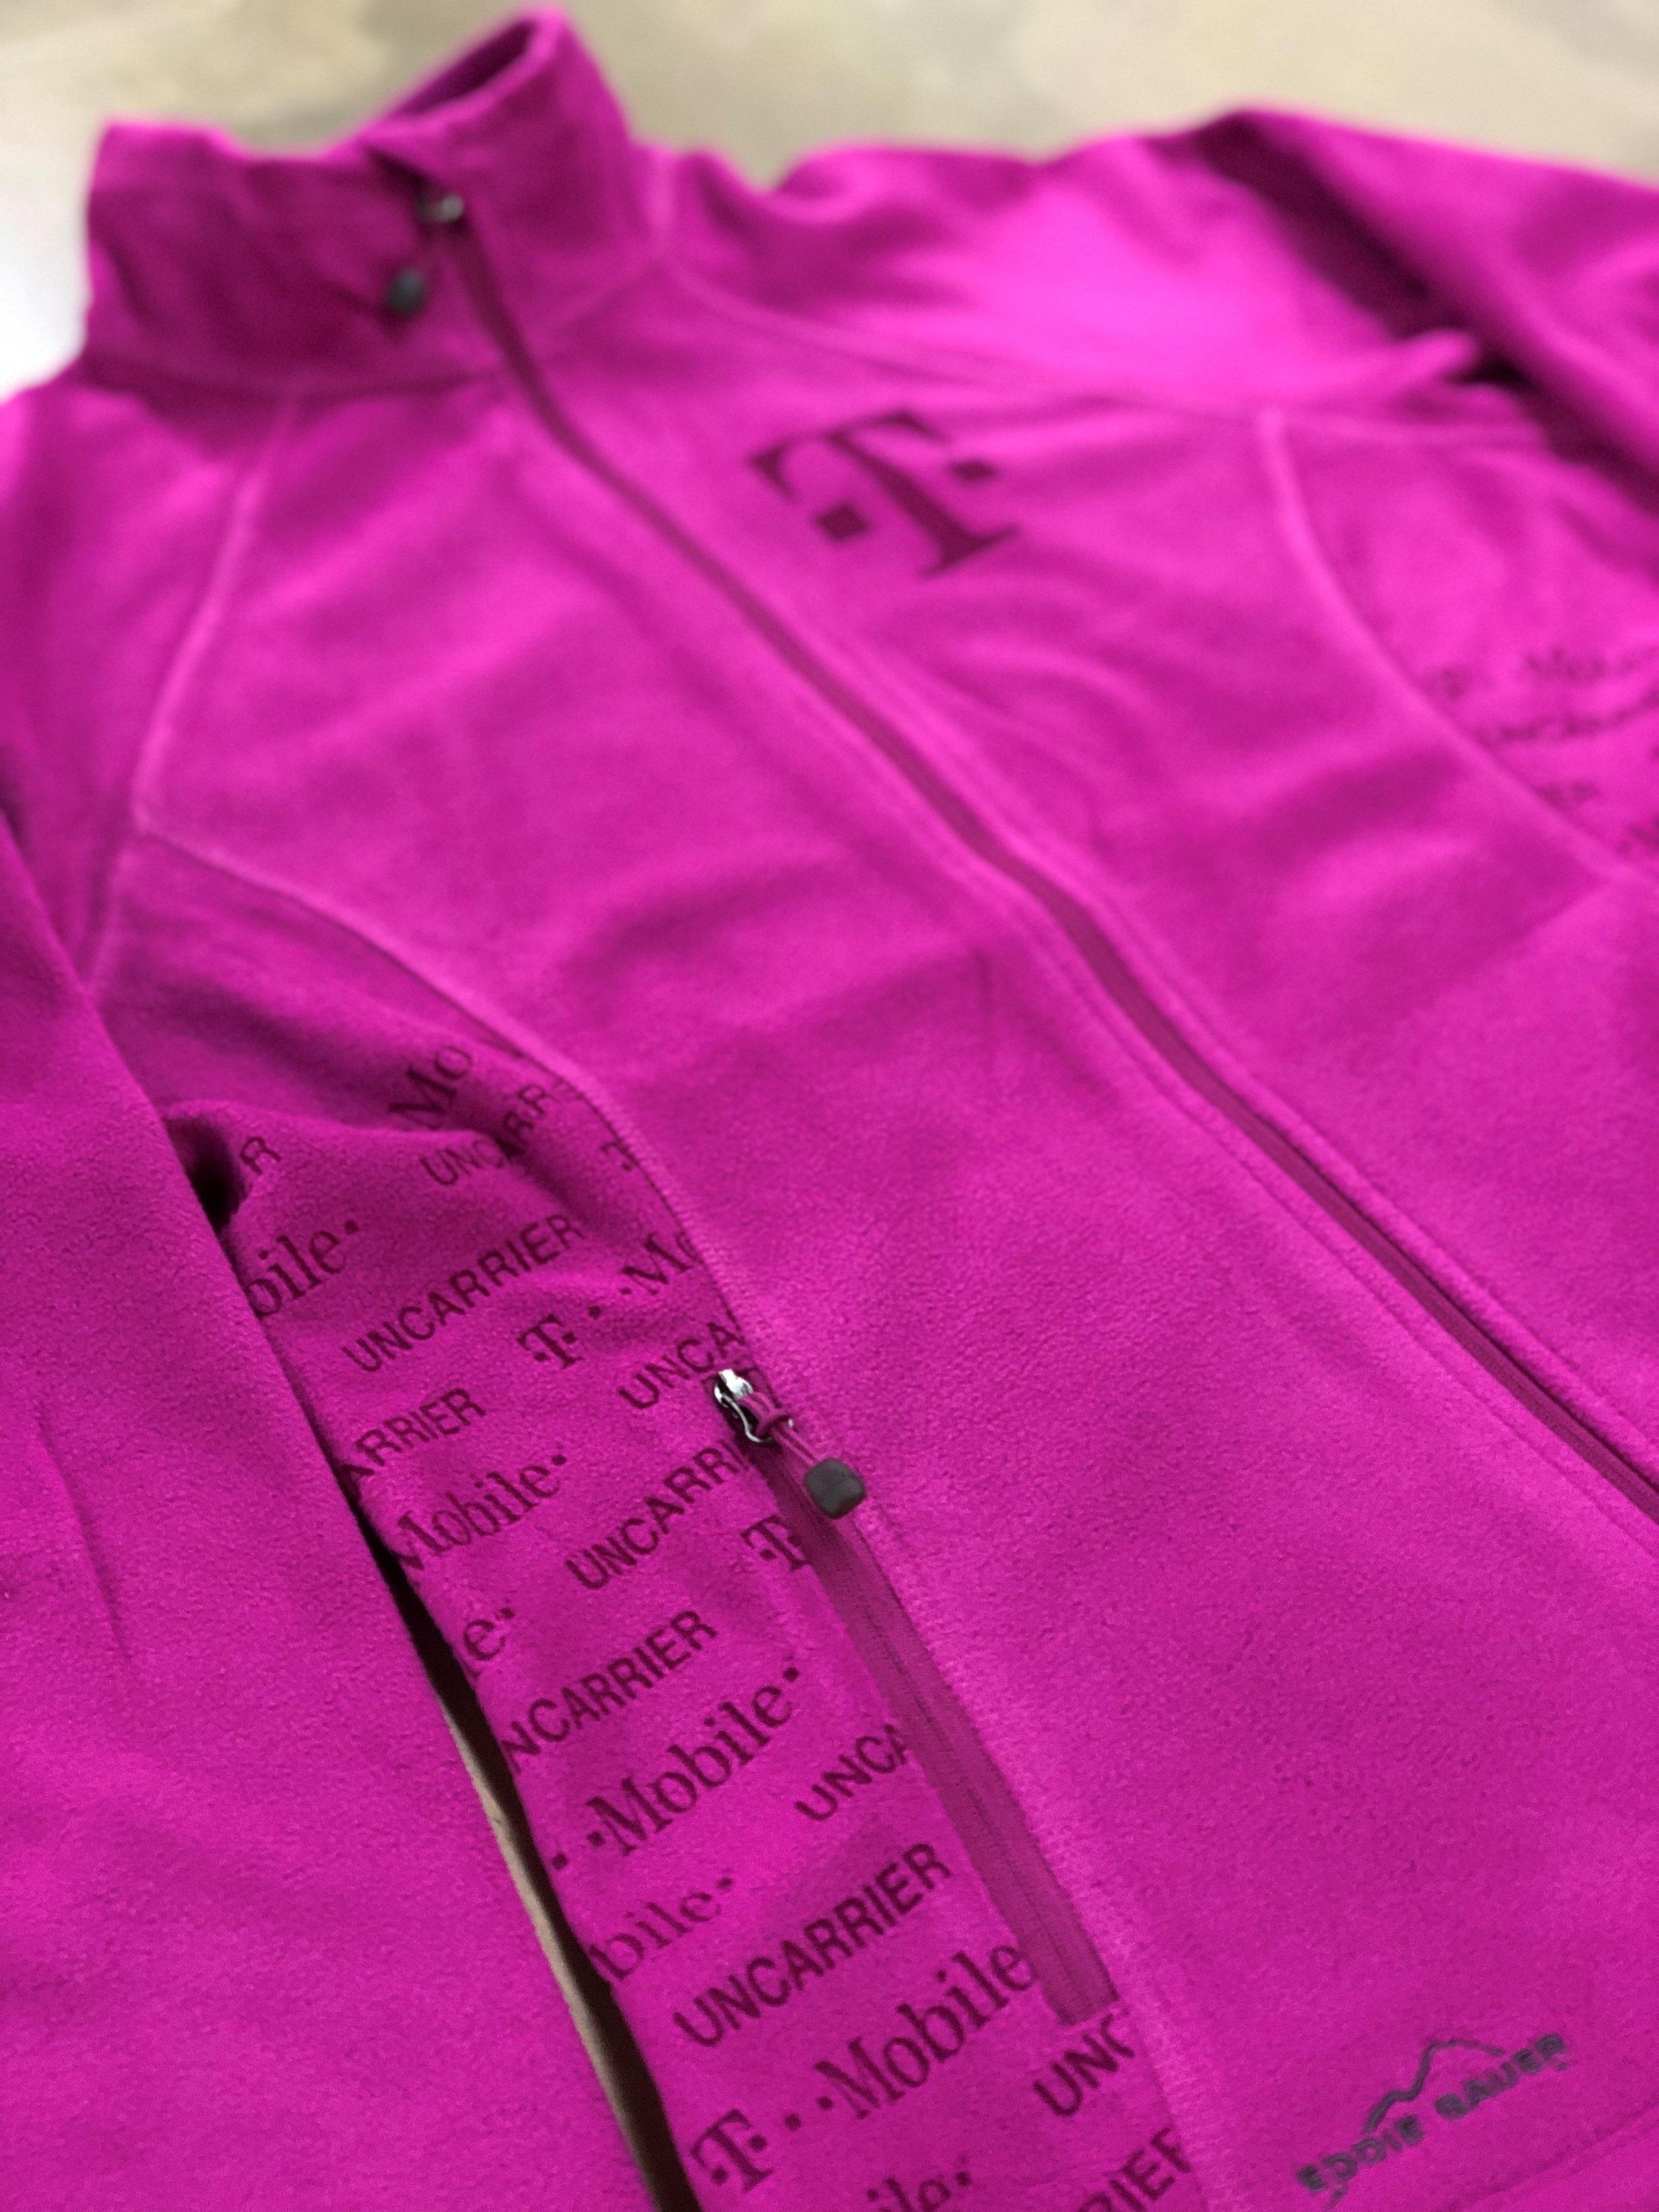 logounltd_laser_embroidery_screen_printing_apparel_uniform_custom_tshirts_kirkland_bellevue_seattle_redmond_branded_merchandise_promotional_products_logo_unltd_t_mobile_Tuesday_tmobile_un_carrier_magenta_5G_john_lege (18).jpg